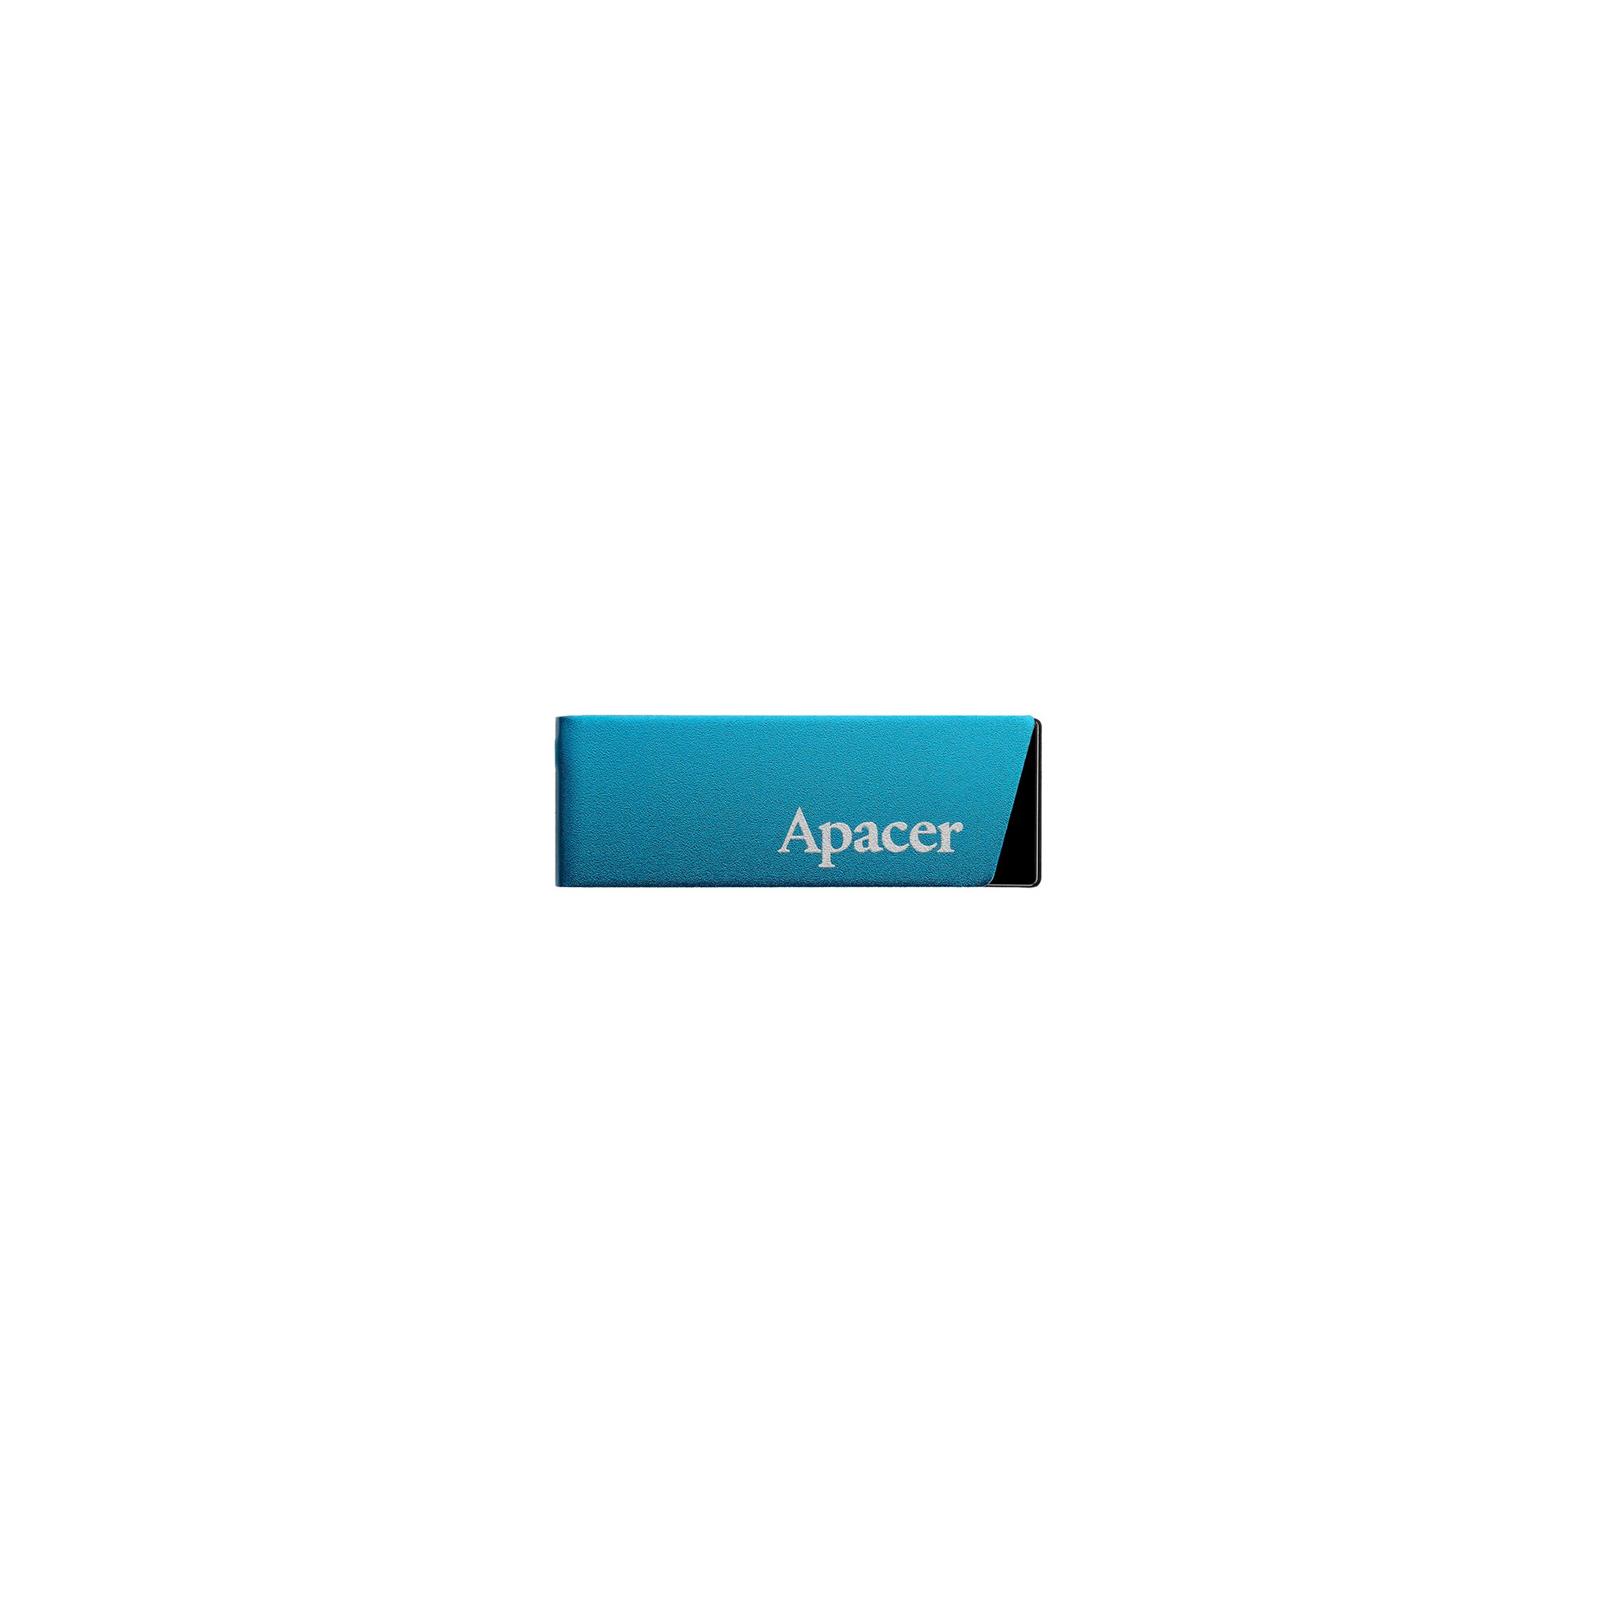 USB флеш накопитель 8GB AH130 Blue RP USB2.0 Apacer (AP8GAH130U-1)